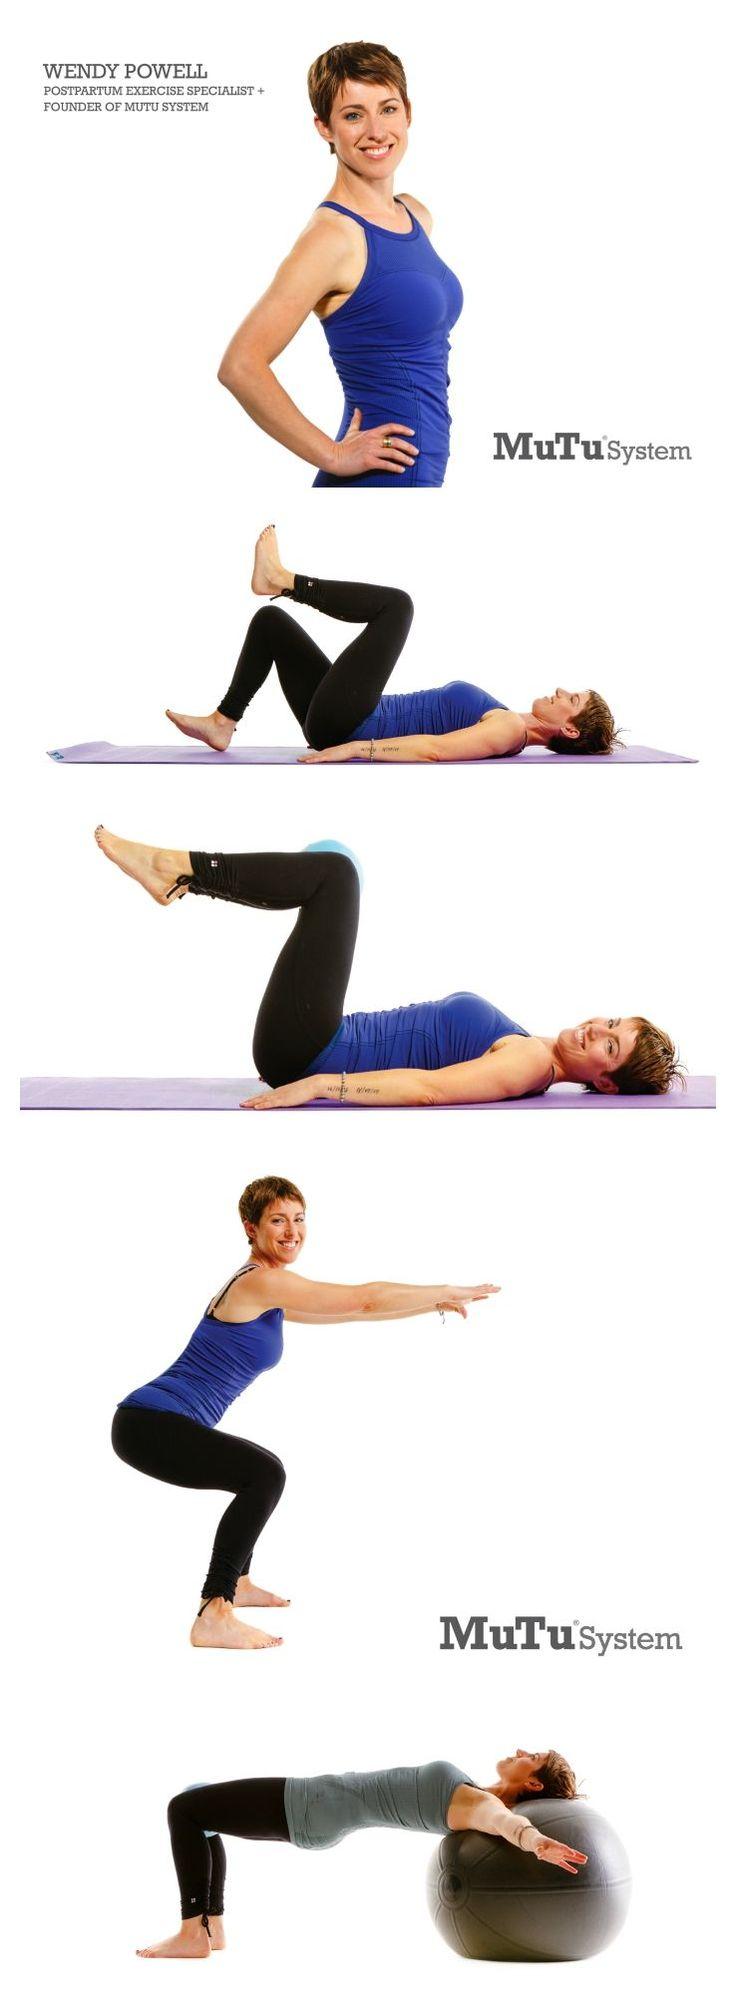 How to safely fix DIASTASIS RECTI with exercise. (No surgery needed!)